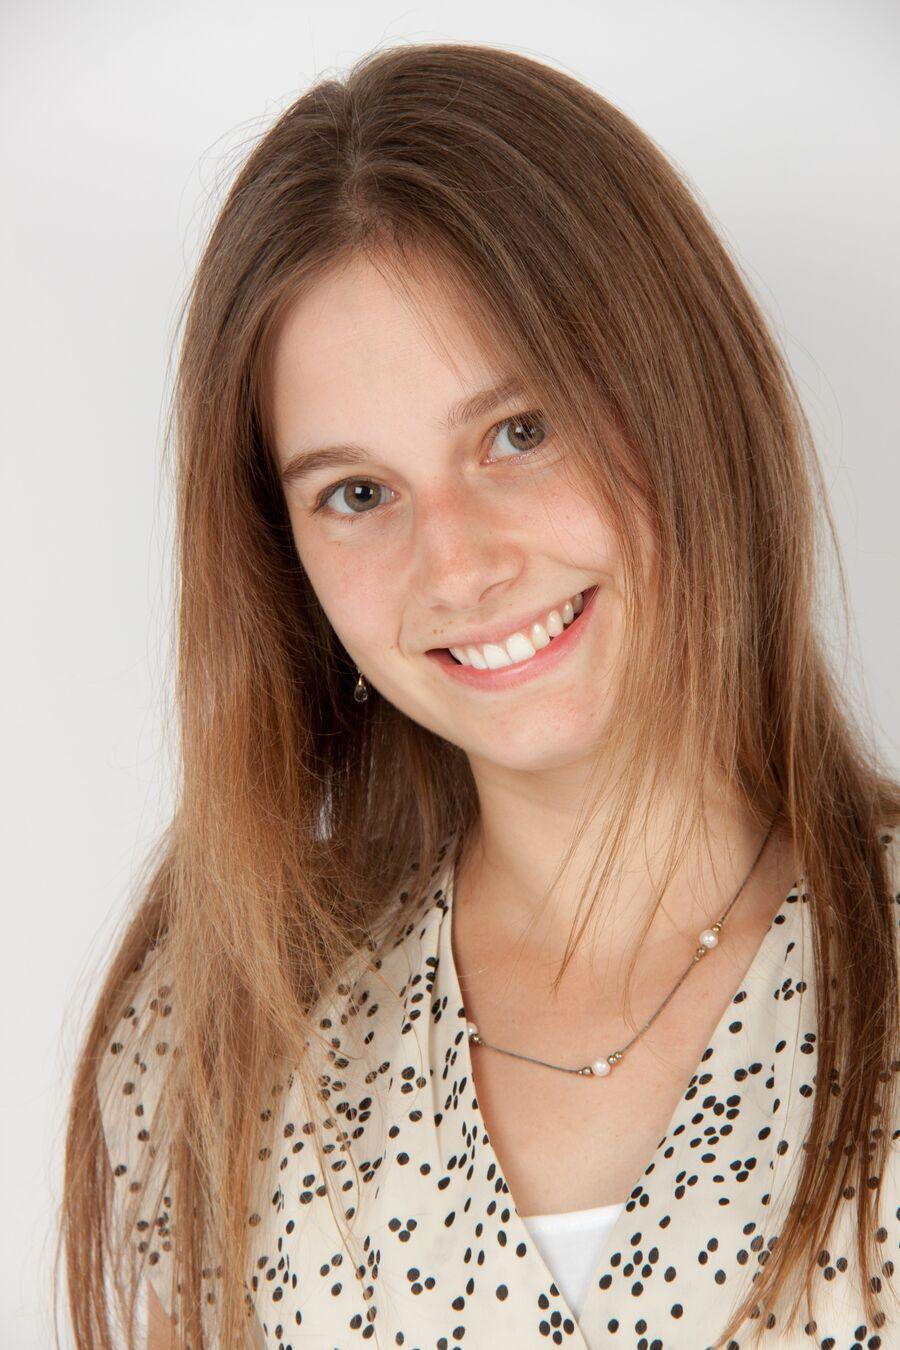 Sommerbogsfest med forfatter Camilla Wandahl for skolelever